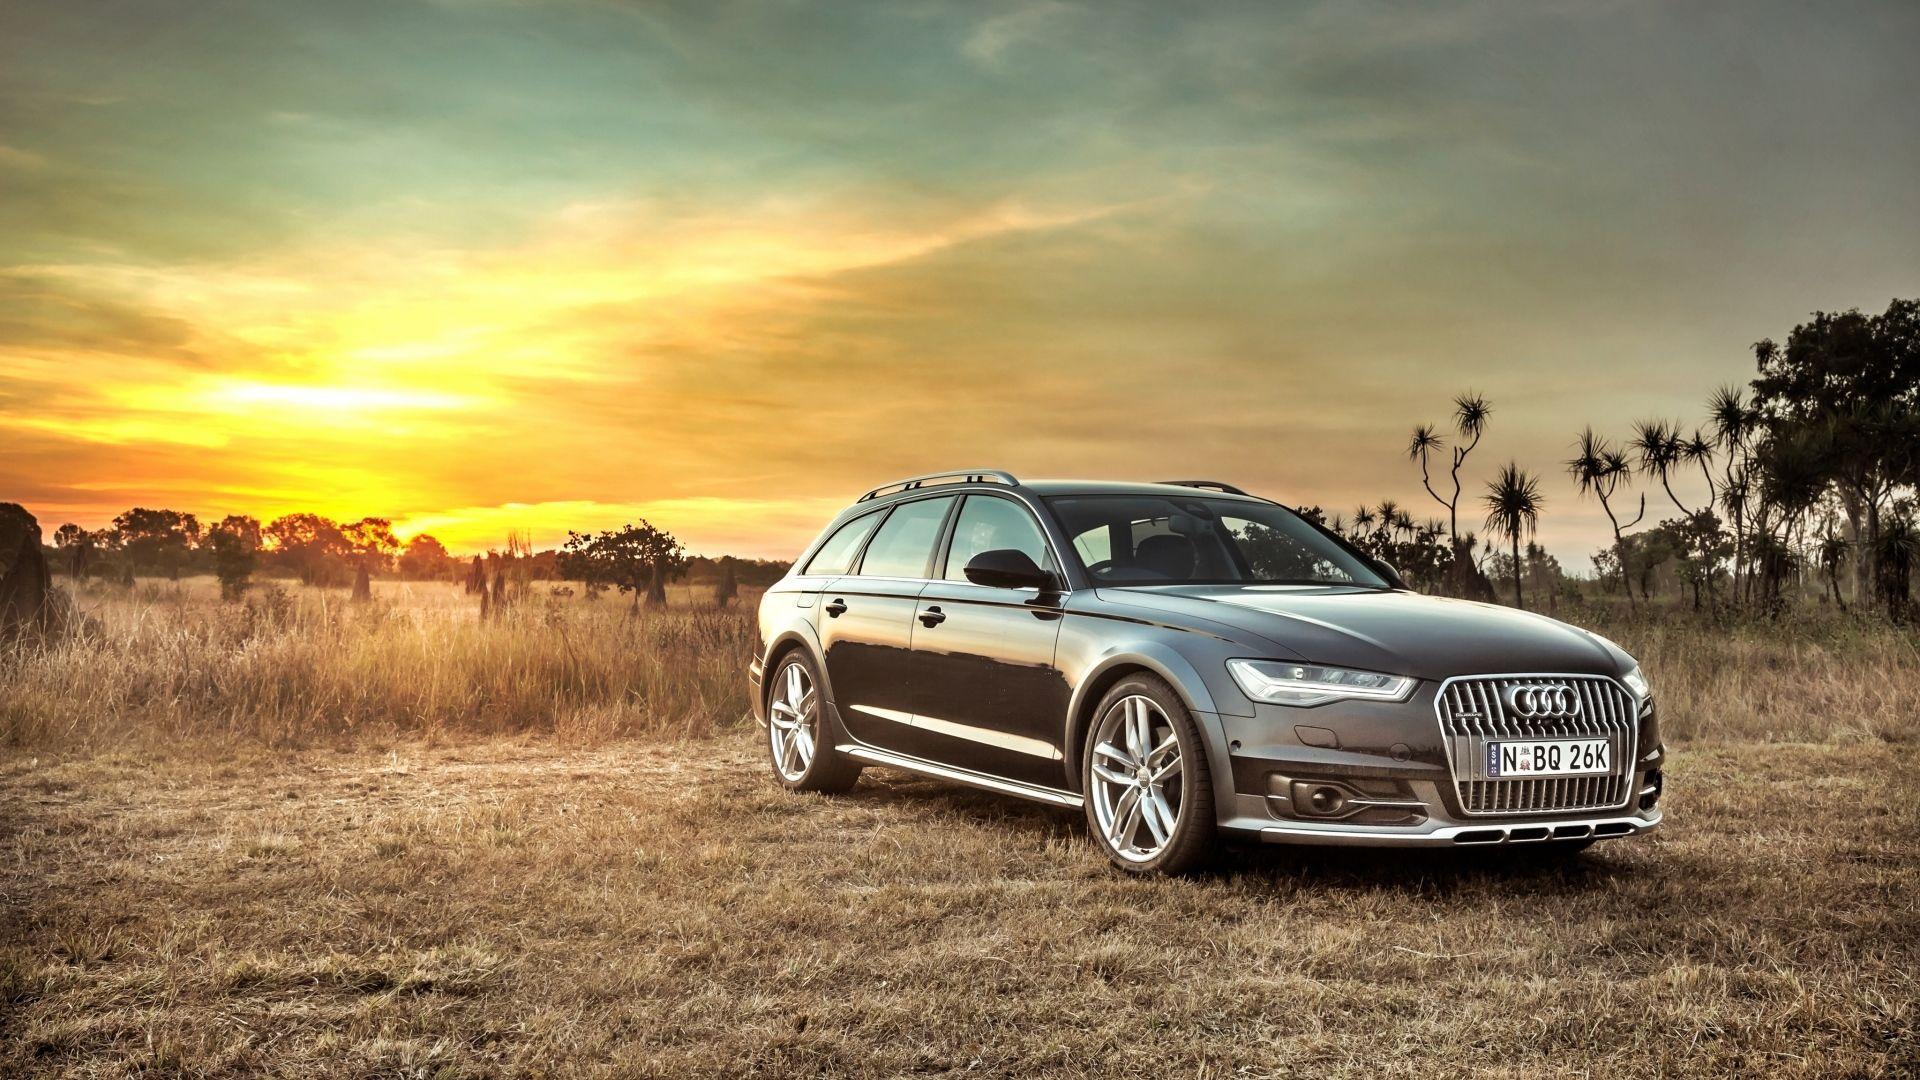 Full HD 1080p Audi Wallpapers HD, Desktop Backgrounds 1920x1080 ...